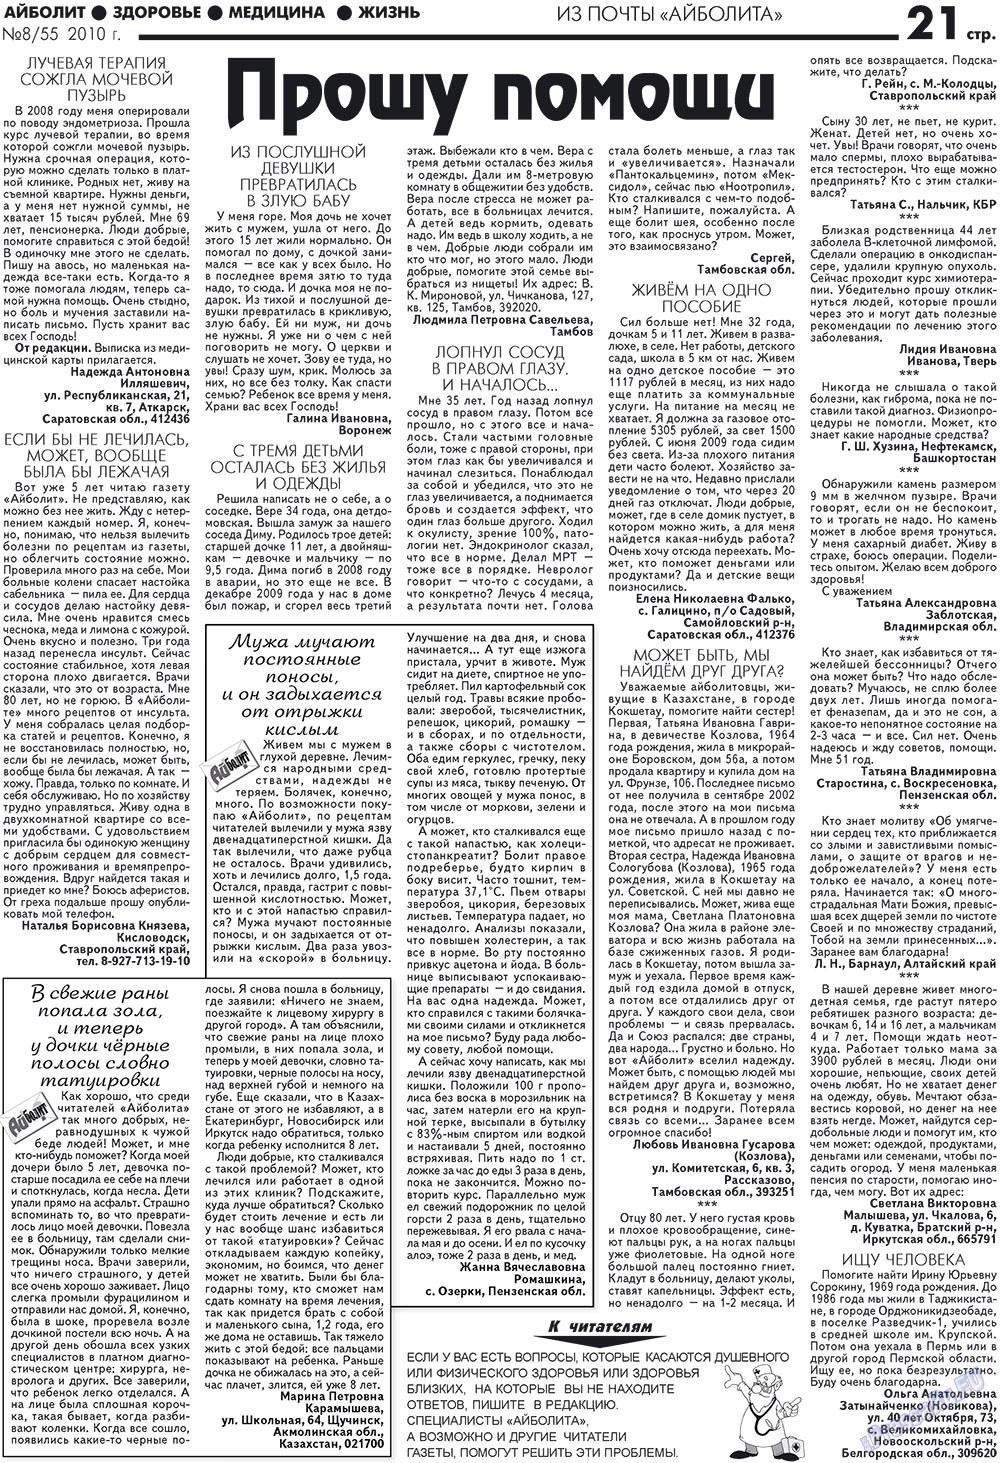 АйБолит (газета). 2010 год, номер 8, стр. 21